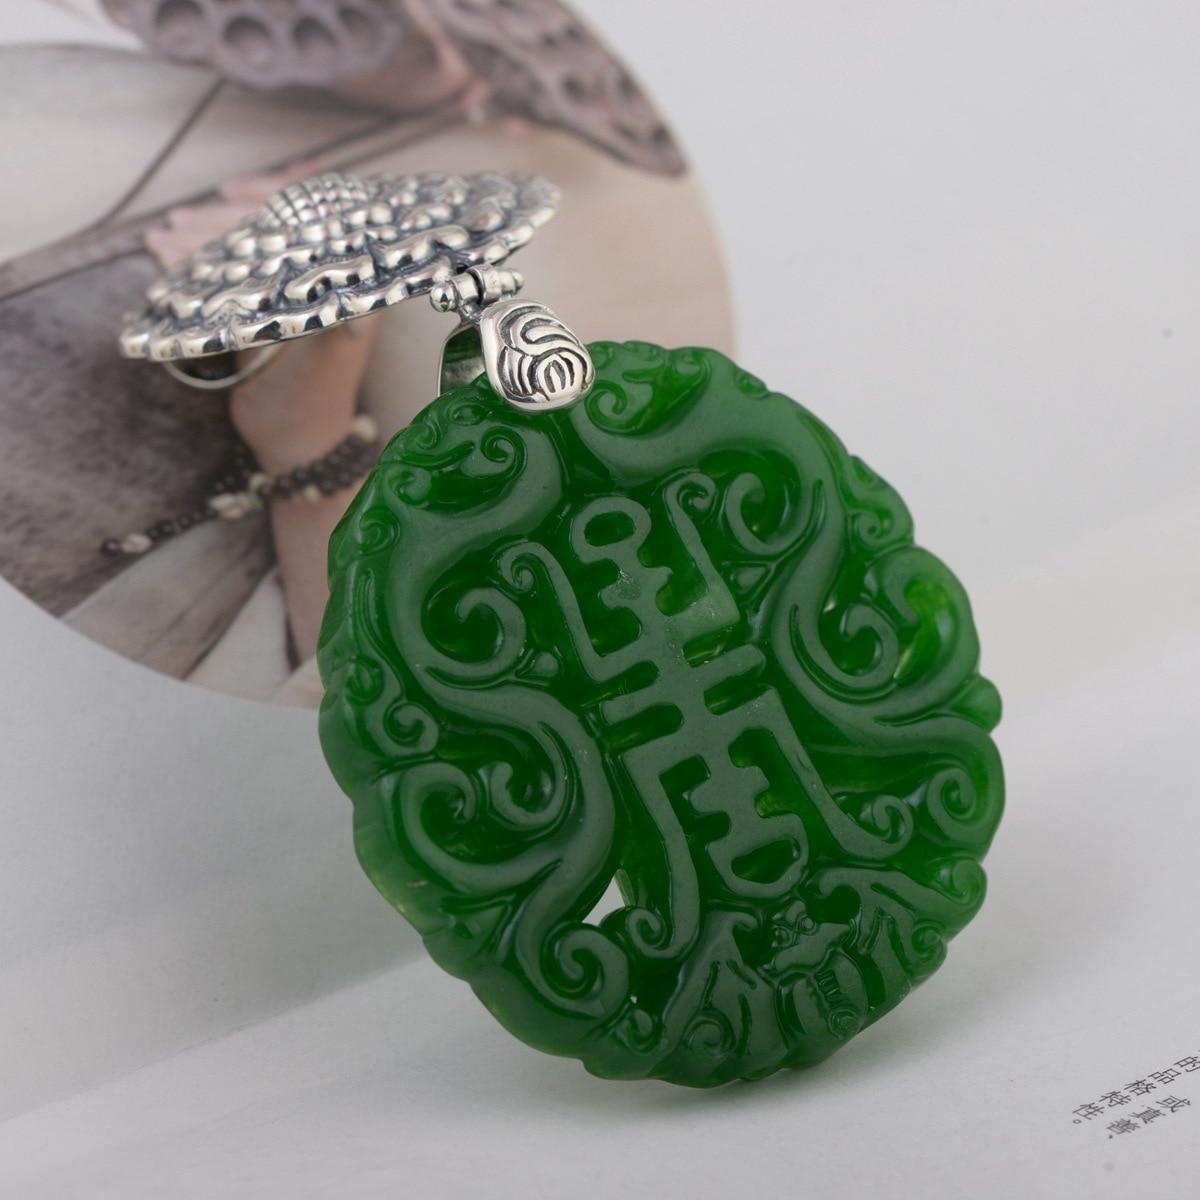 Genuine 925 Sterling Silver Natural Green Jade Pendant Vintage Flowers Engraved Large Gemstone Amulet For Women